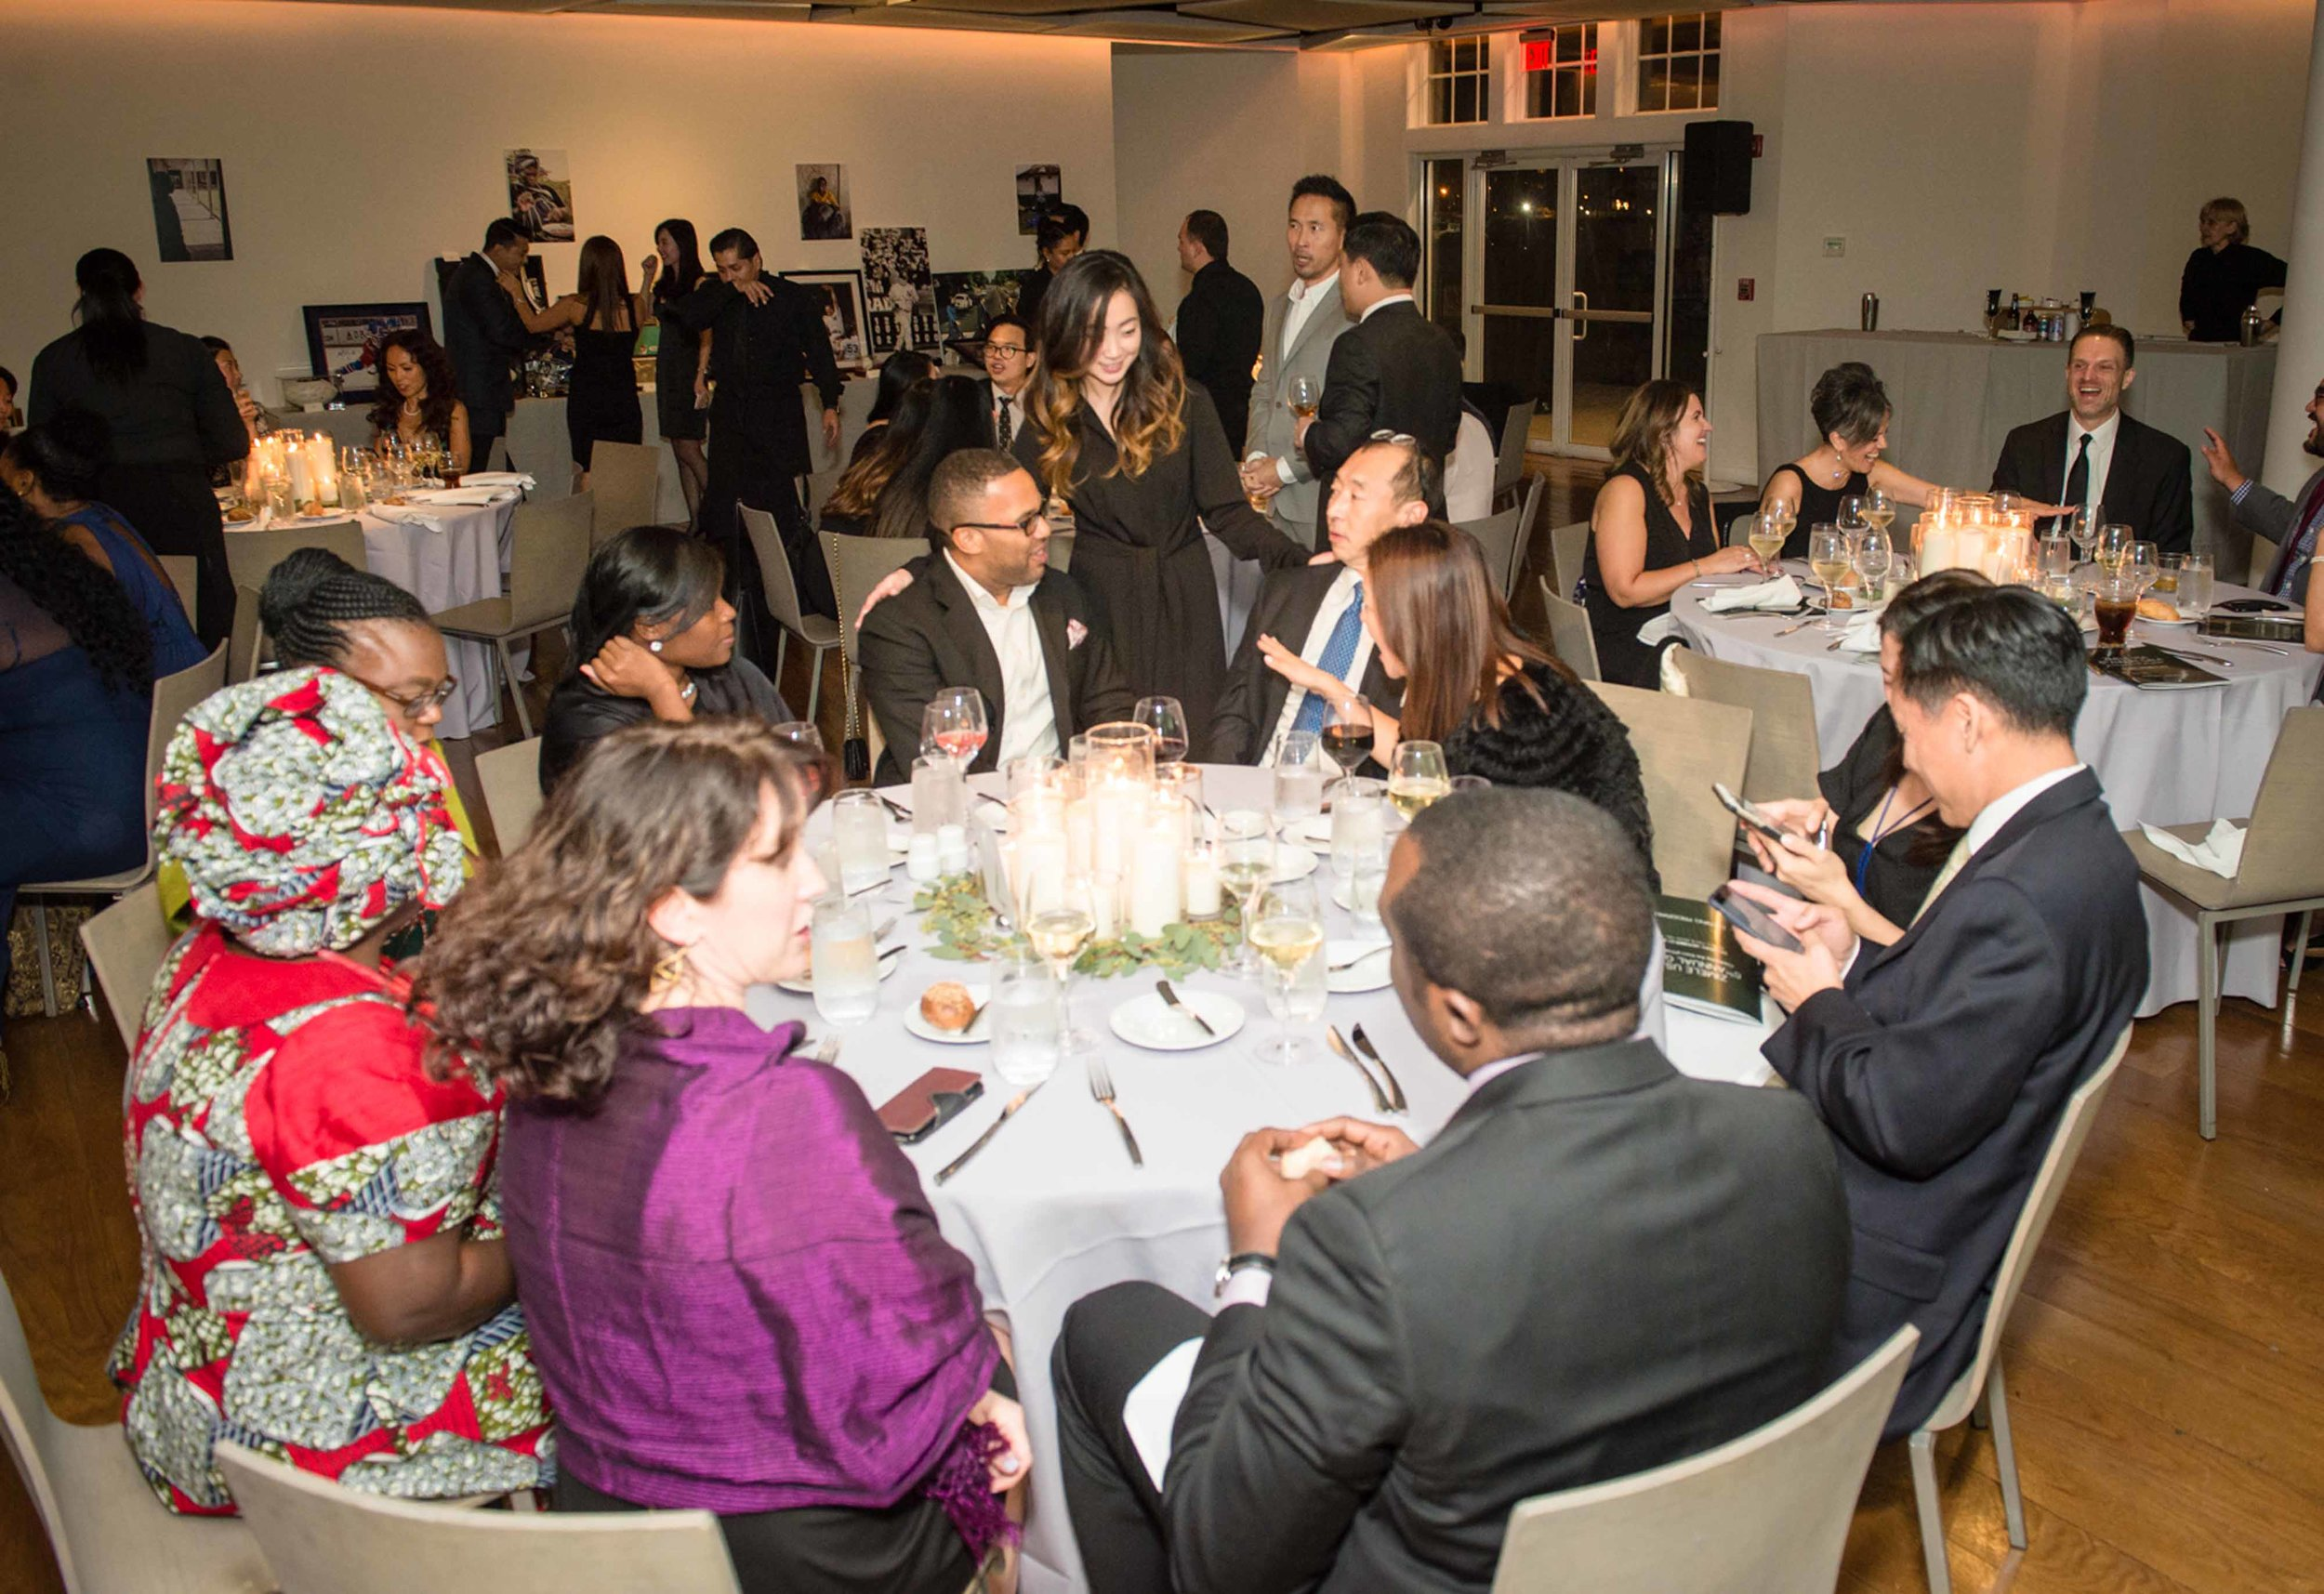 2017-10-21 Zimele USA 6th Annual Gala - Maritime Parc - Jersey City NJ_0135.jpg